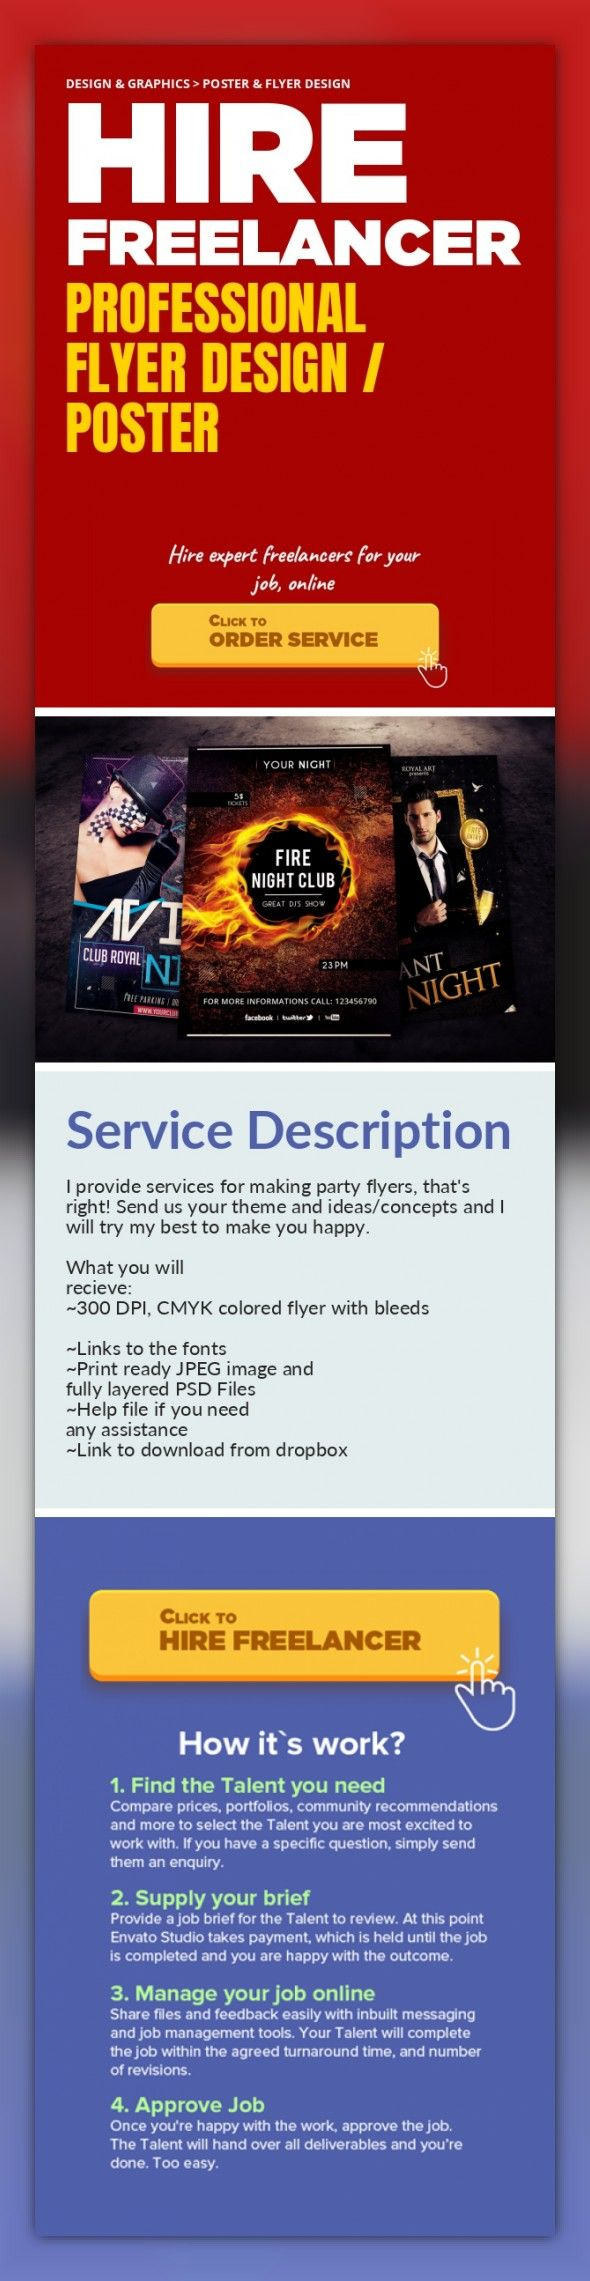 professional flyer design poster design graphics poster flyer